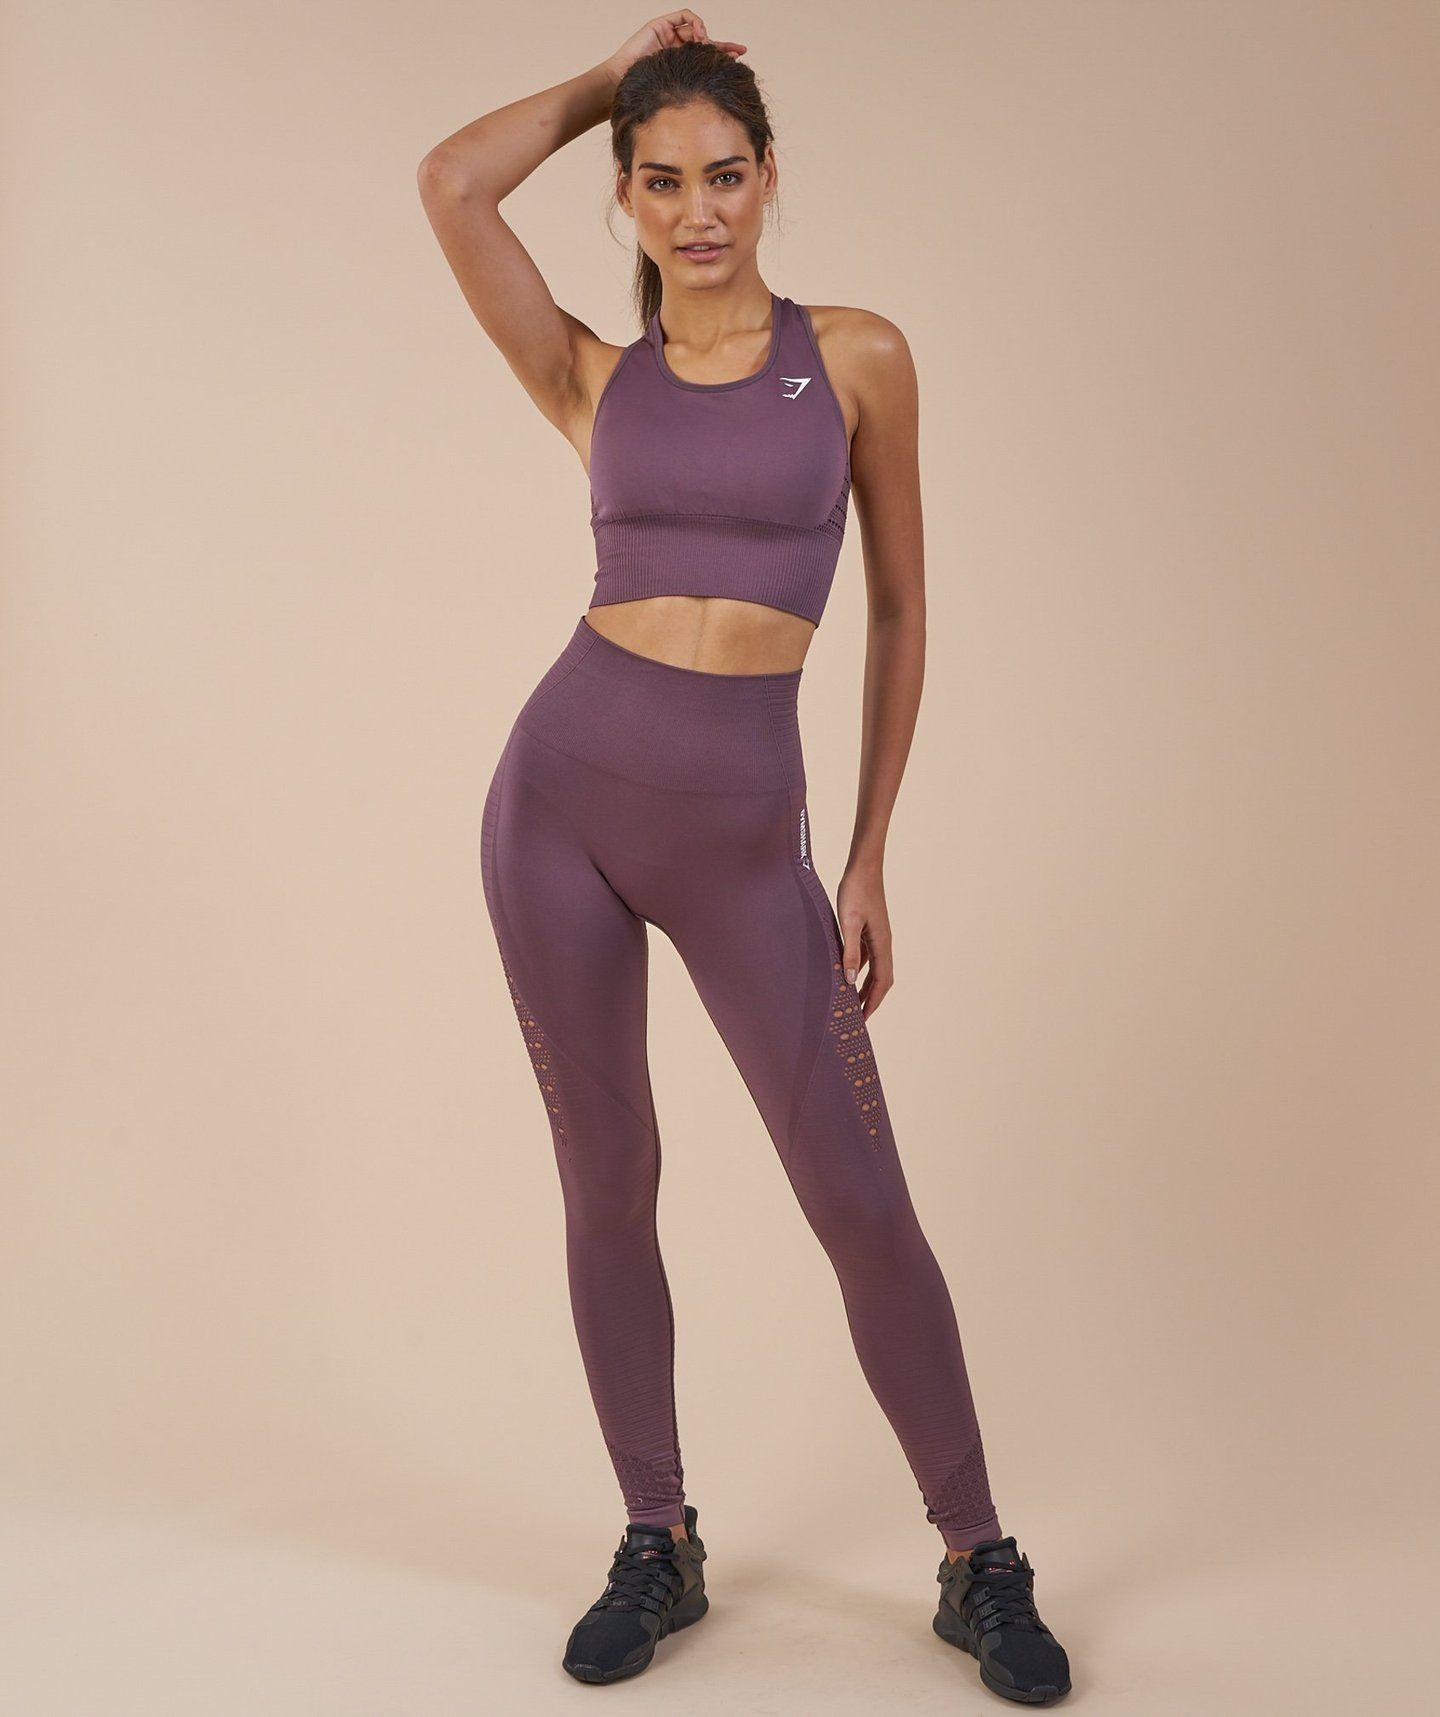 72955fd337cf5 Gymshark Energy Seamless High Waisted Leggings - Purple Wash ...